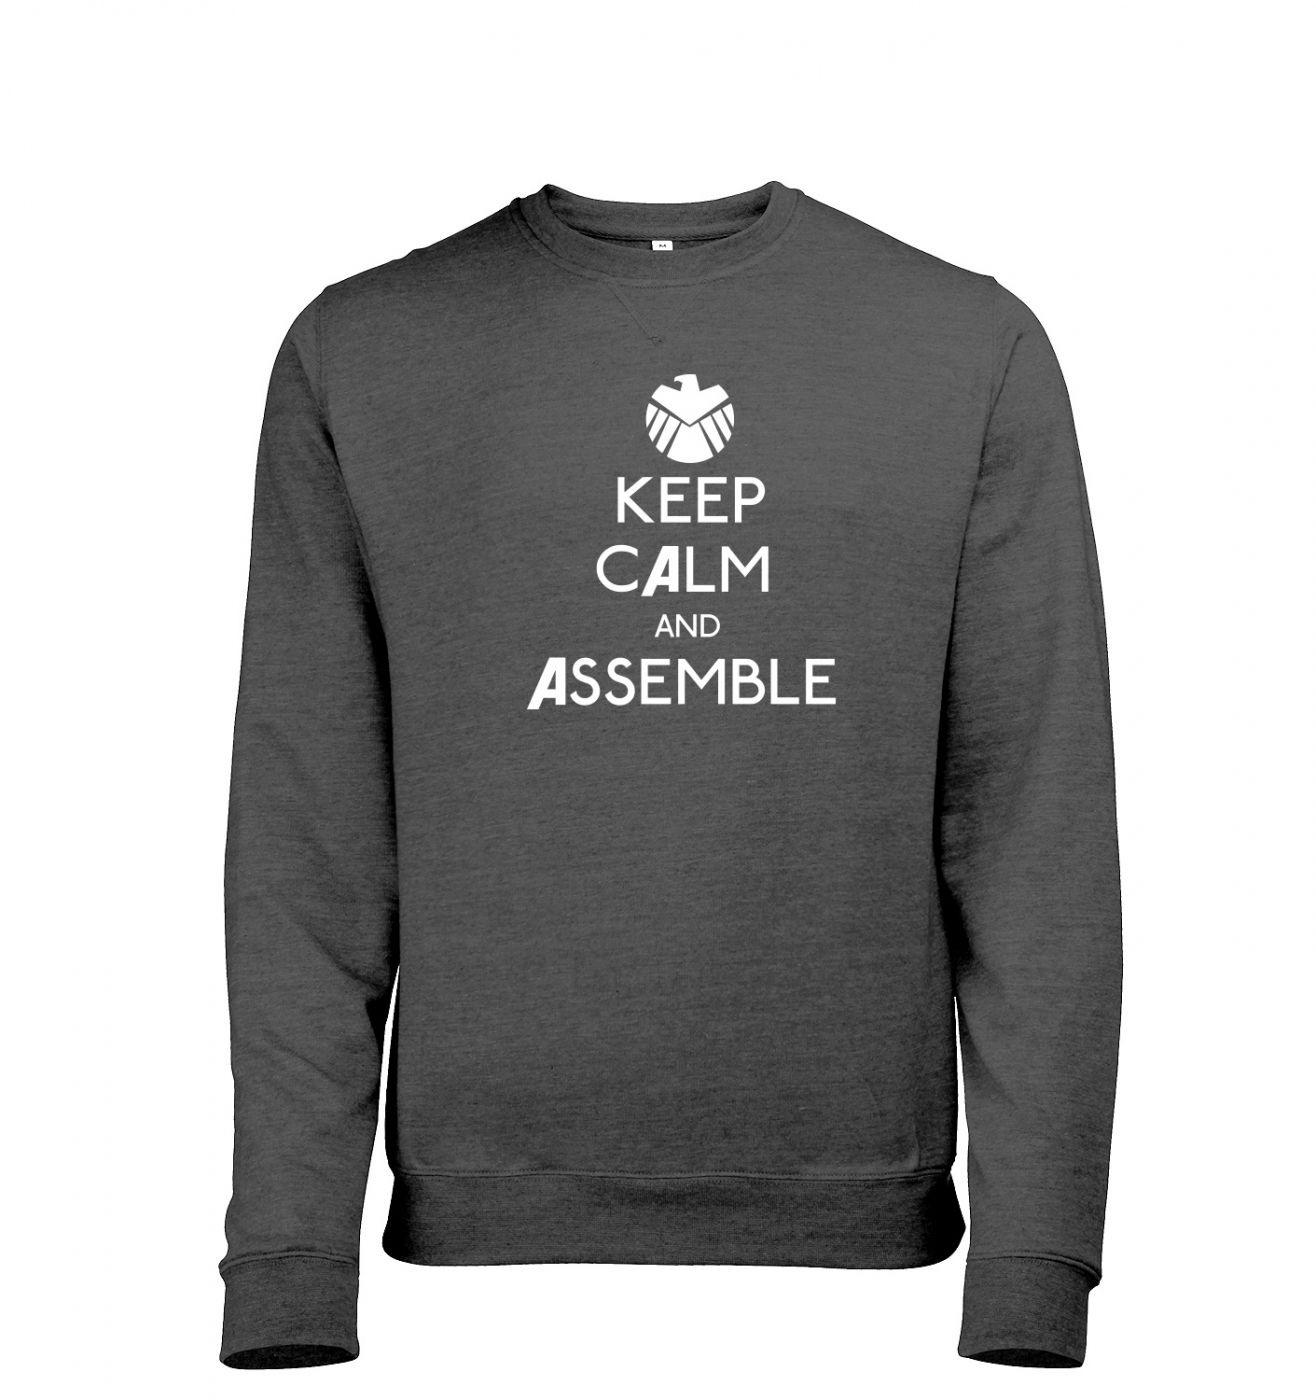 Keep Calm and Assemble heather sweatshirt